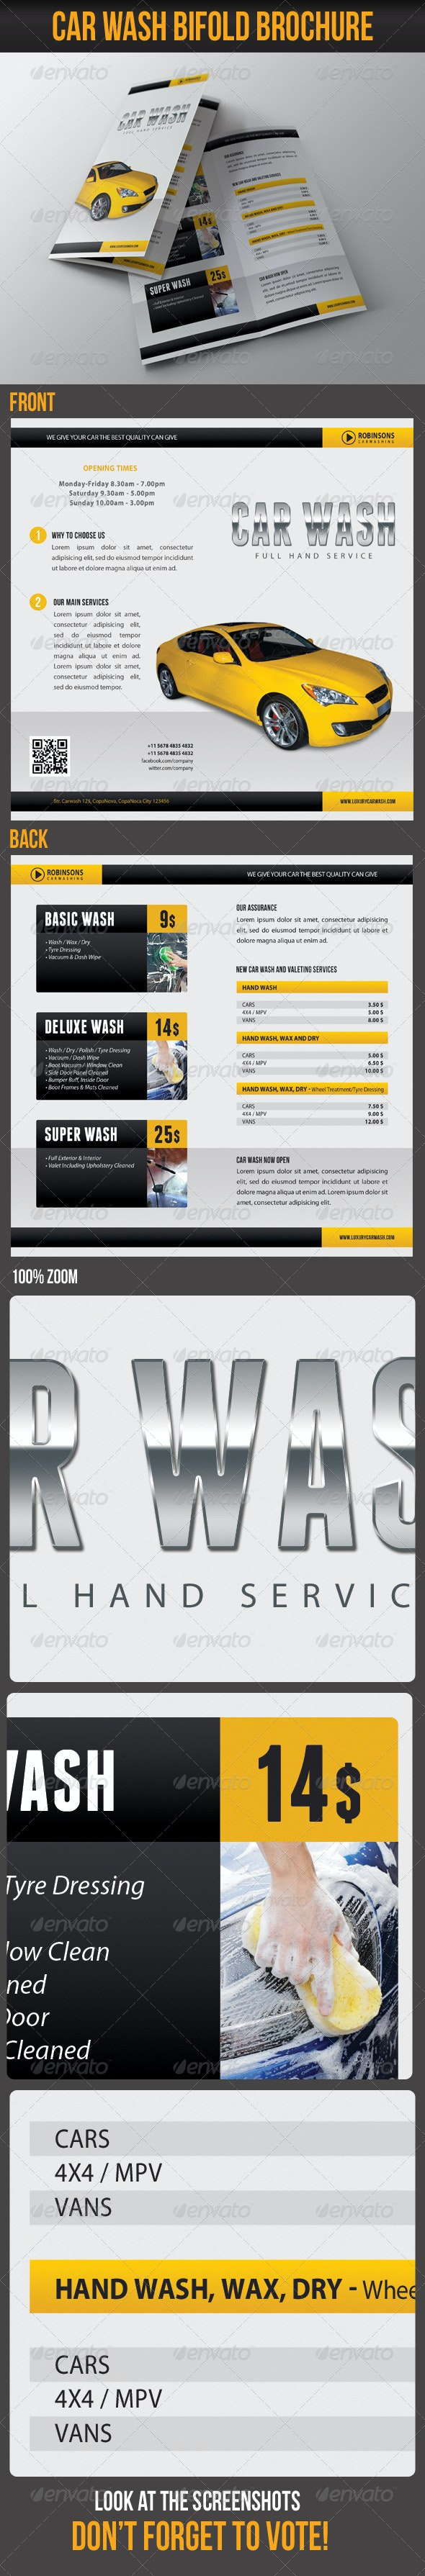 Car Wash Bifold Brochure 01 - Informational Brochures